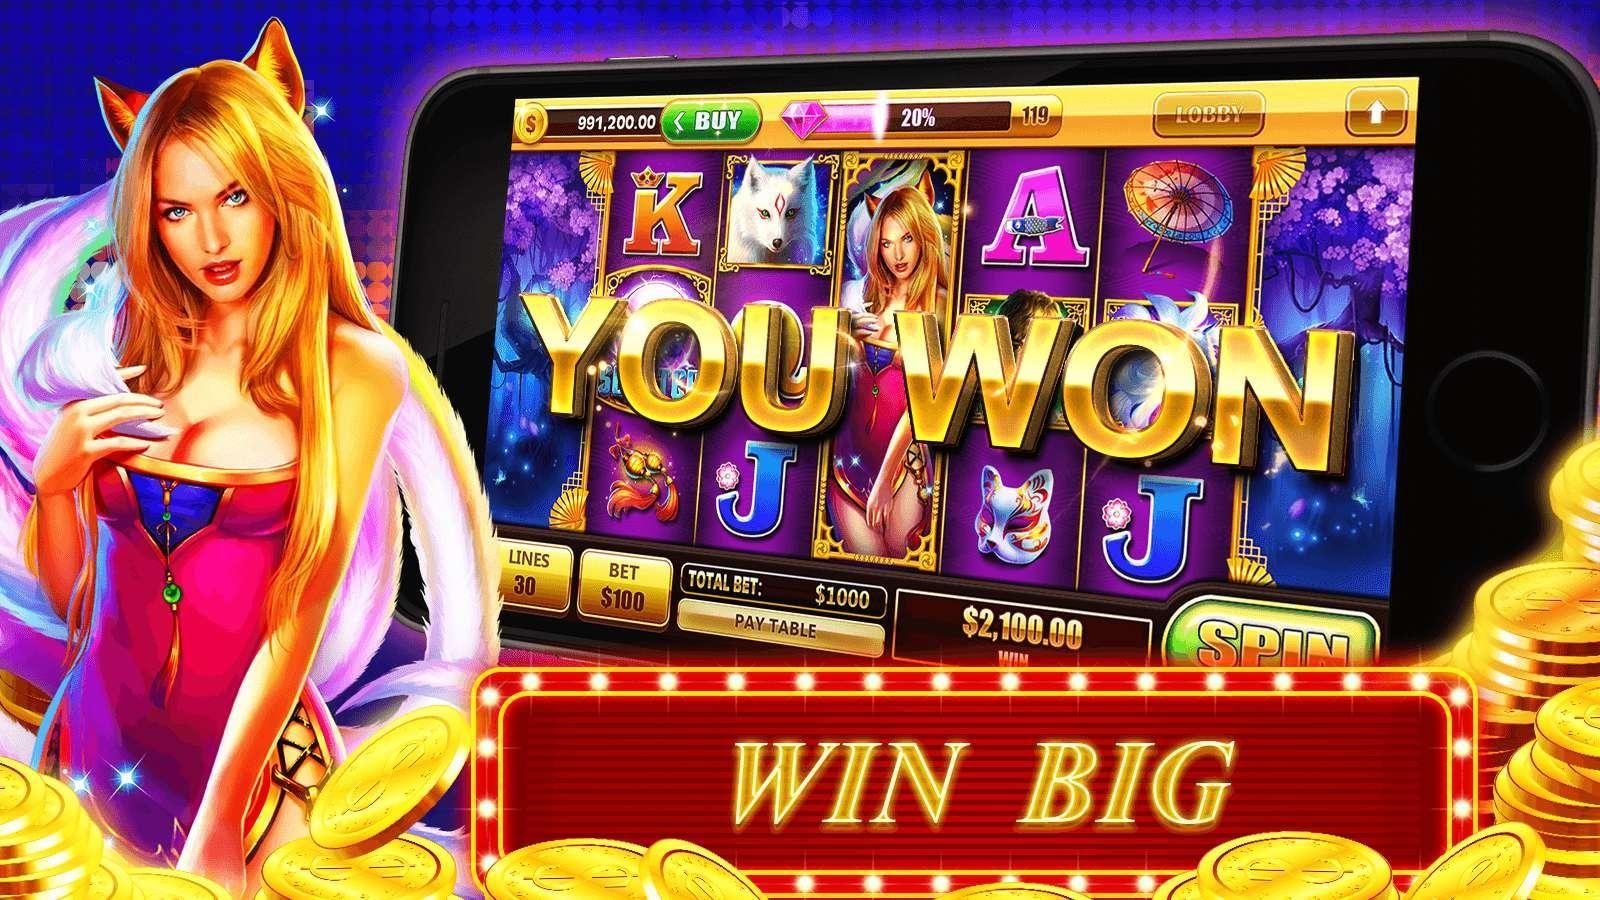 48++ Free online casino slot machine games with bonus rounds info